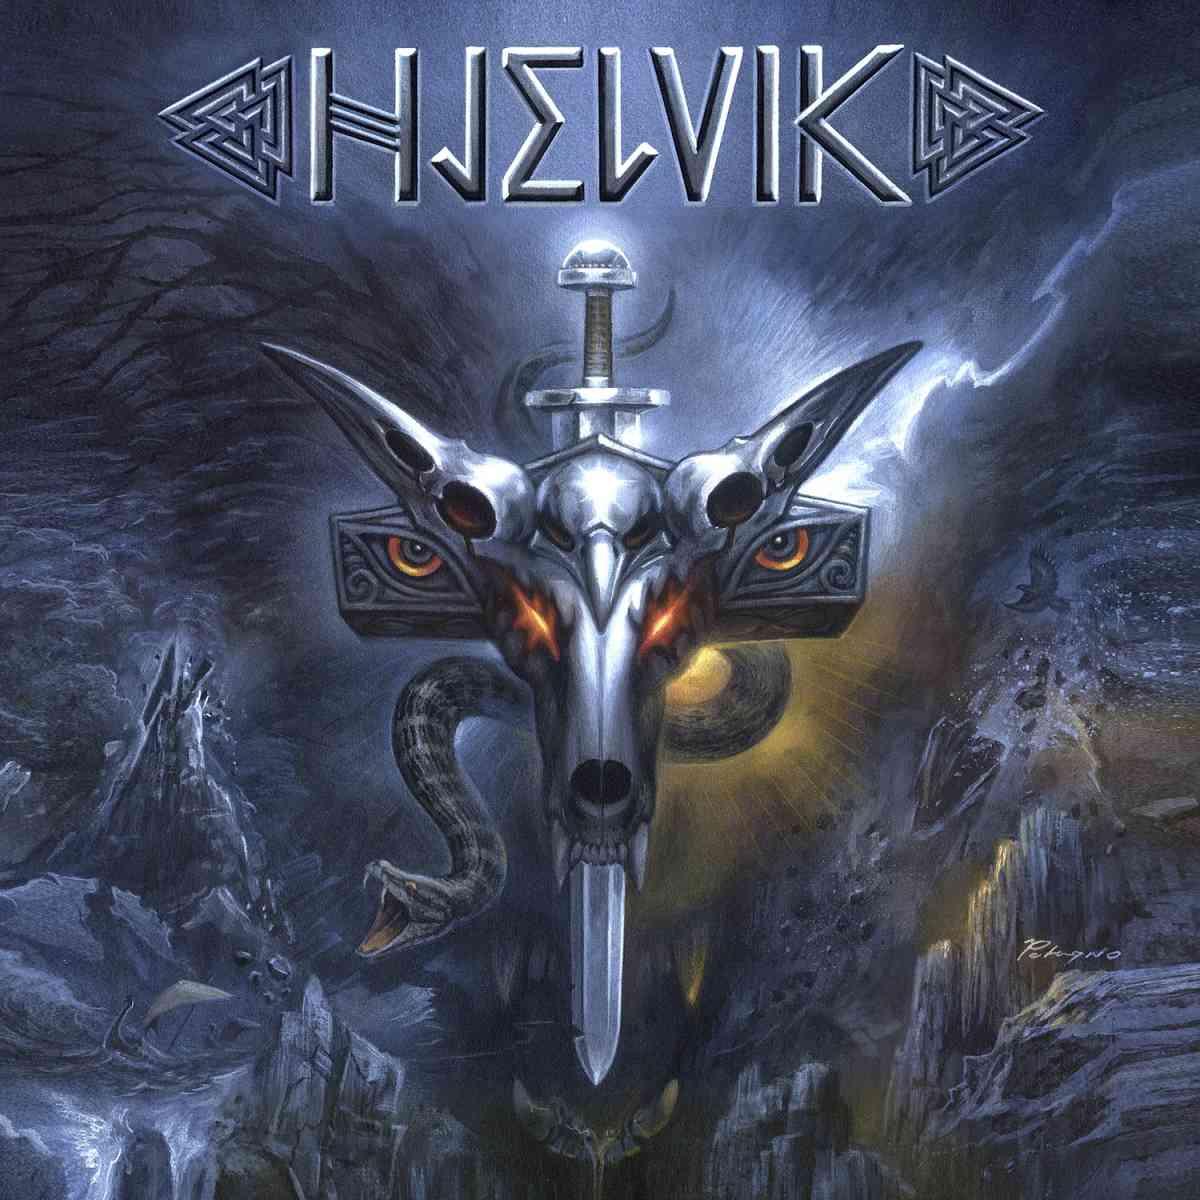 HJELVIK - Welcome To Hel - album cover